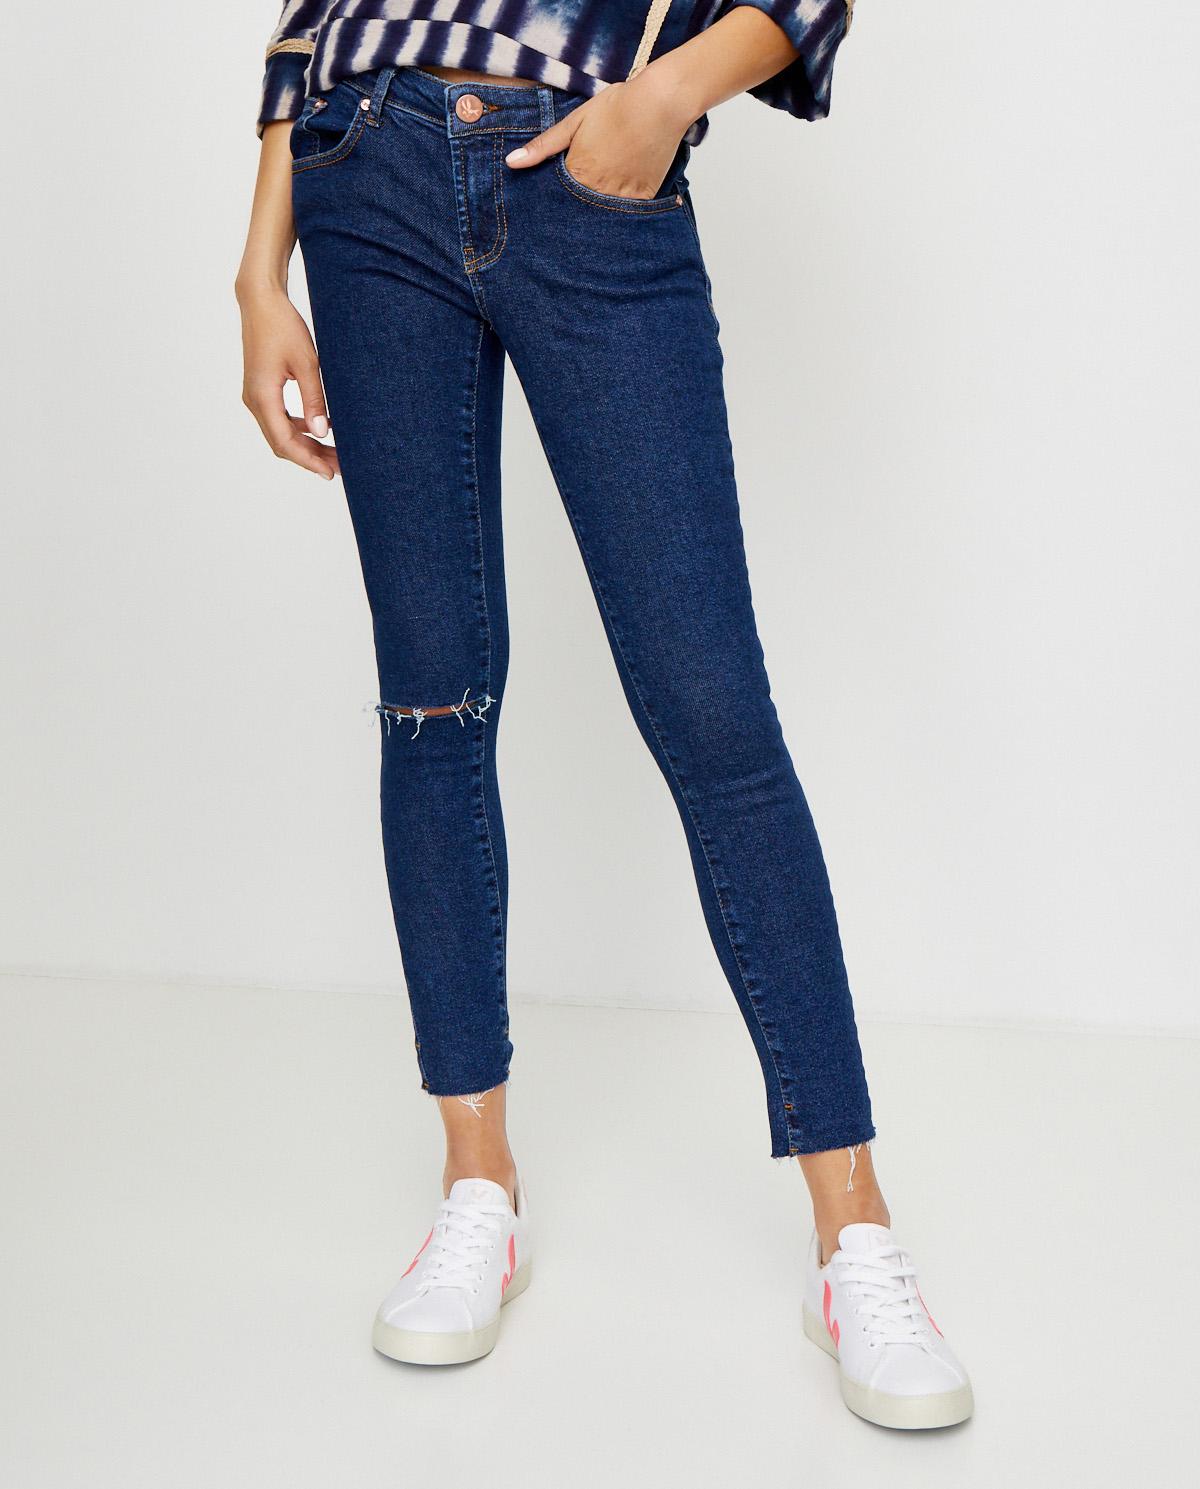 Damskie jeansy Freebirds II ONETEASPOON 22597 MANHAT BL